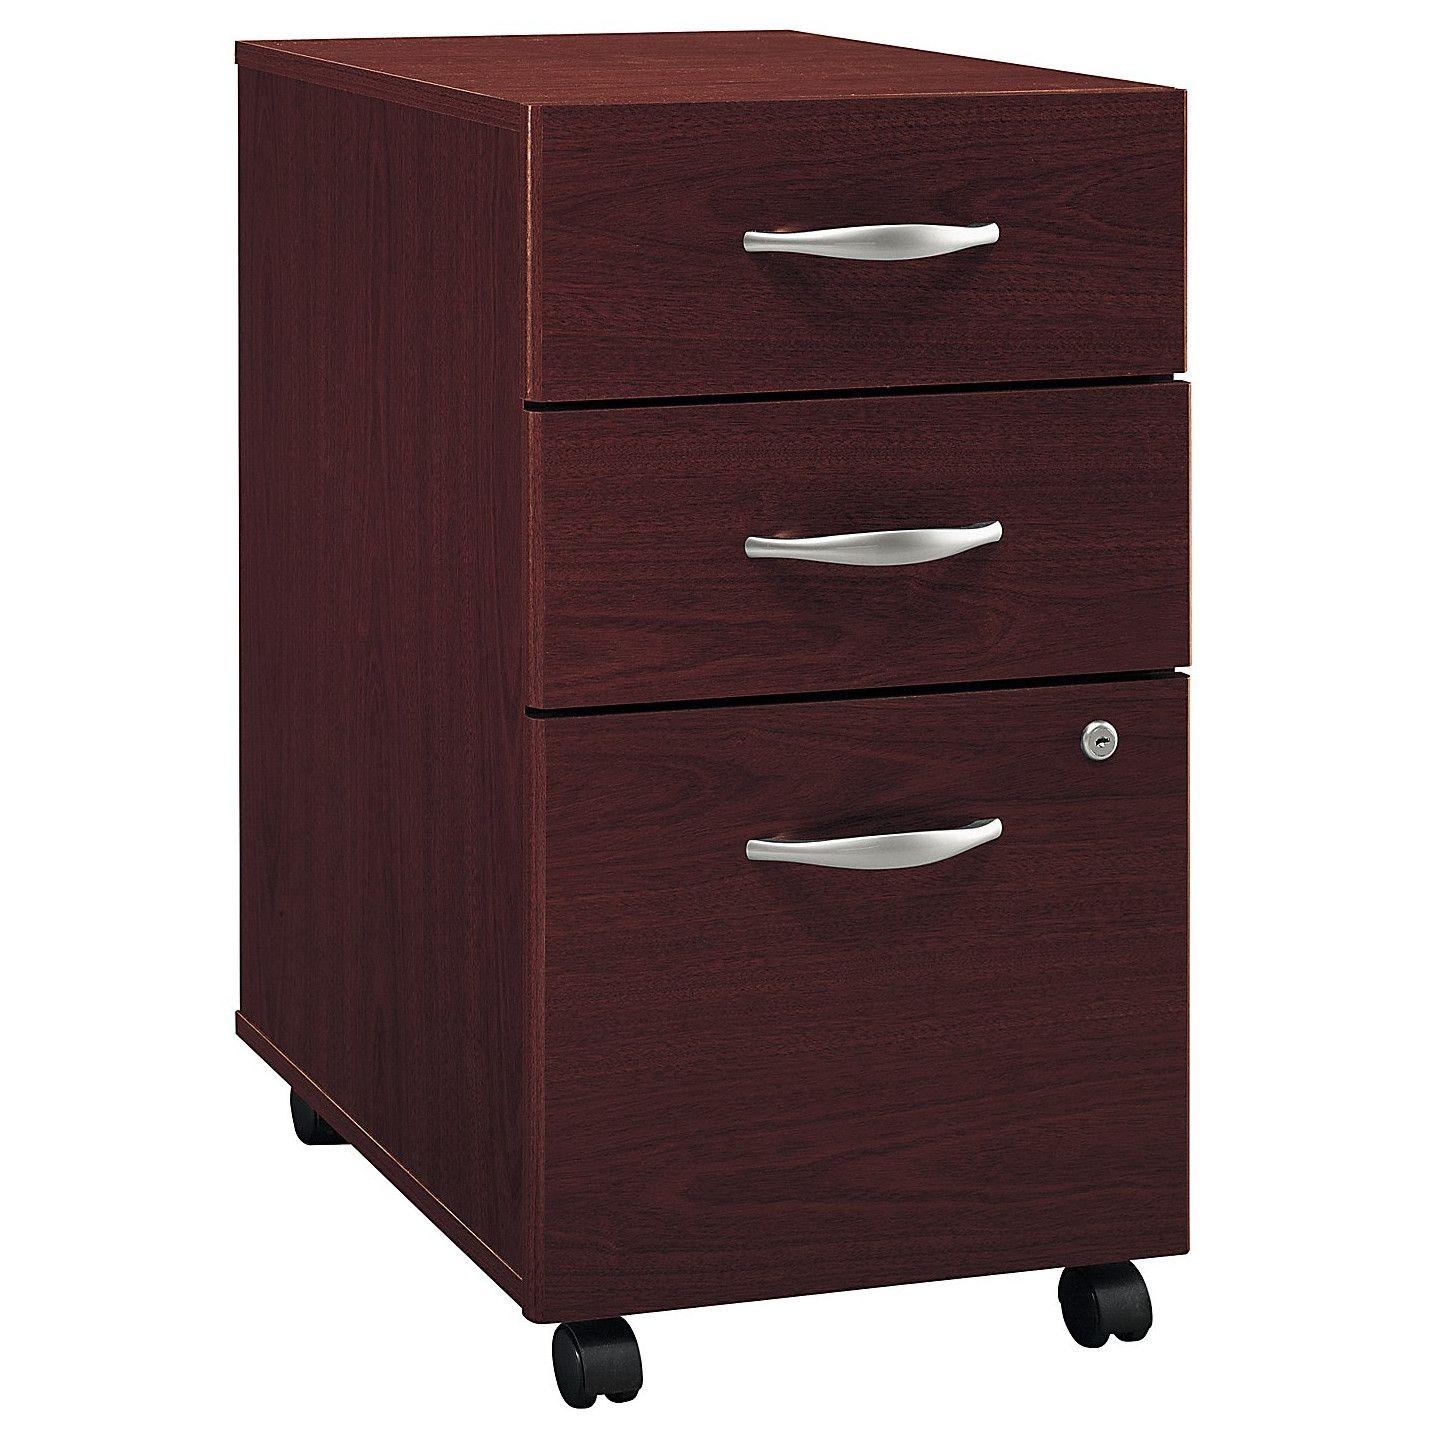 Hon 3 Drawer Mobile File Cabinet